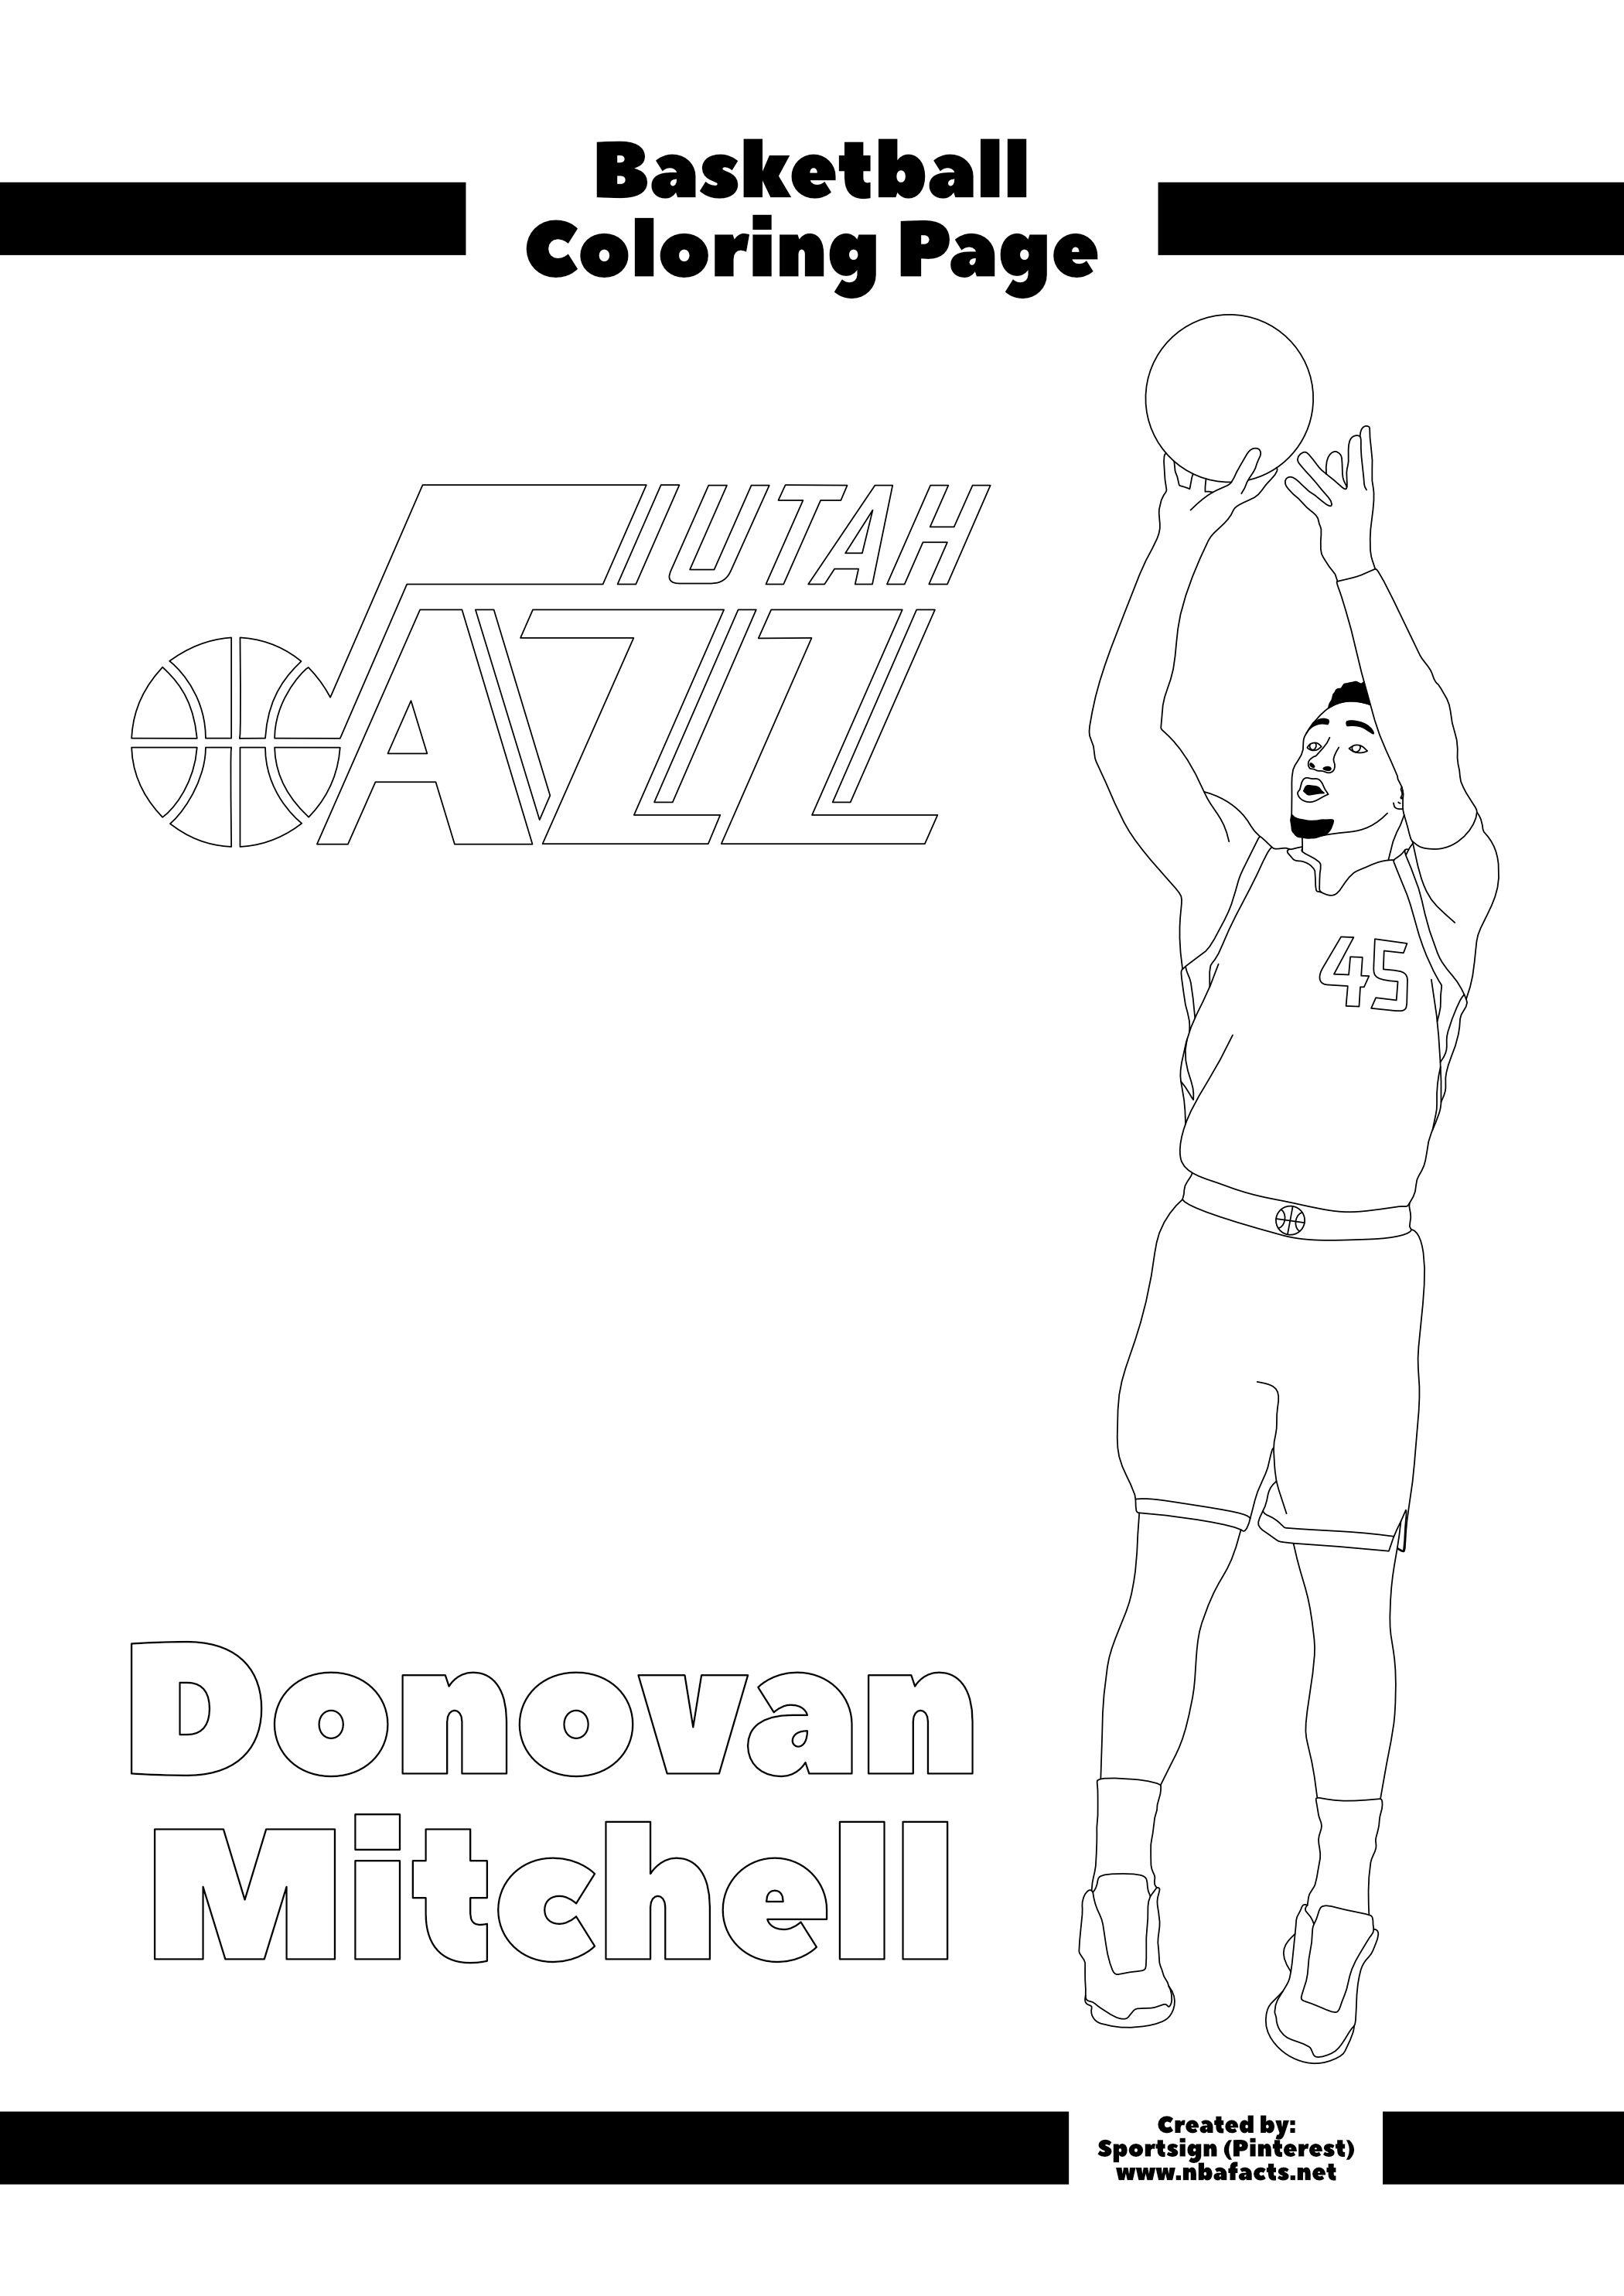 Donovan Mitchell Free Nba Kids Coloring Sheet Coloring For Kids Coloring Sheets For Kids Donovan Mitchell